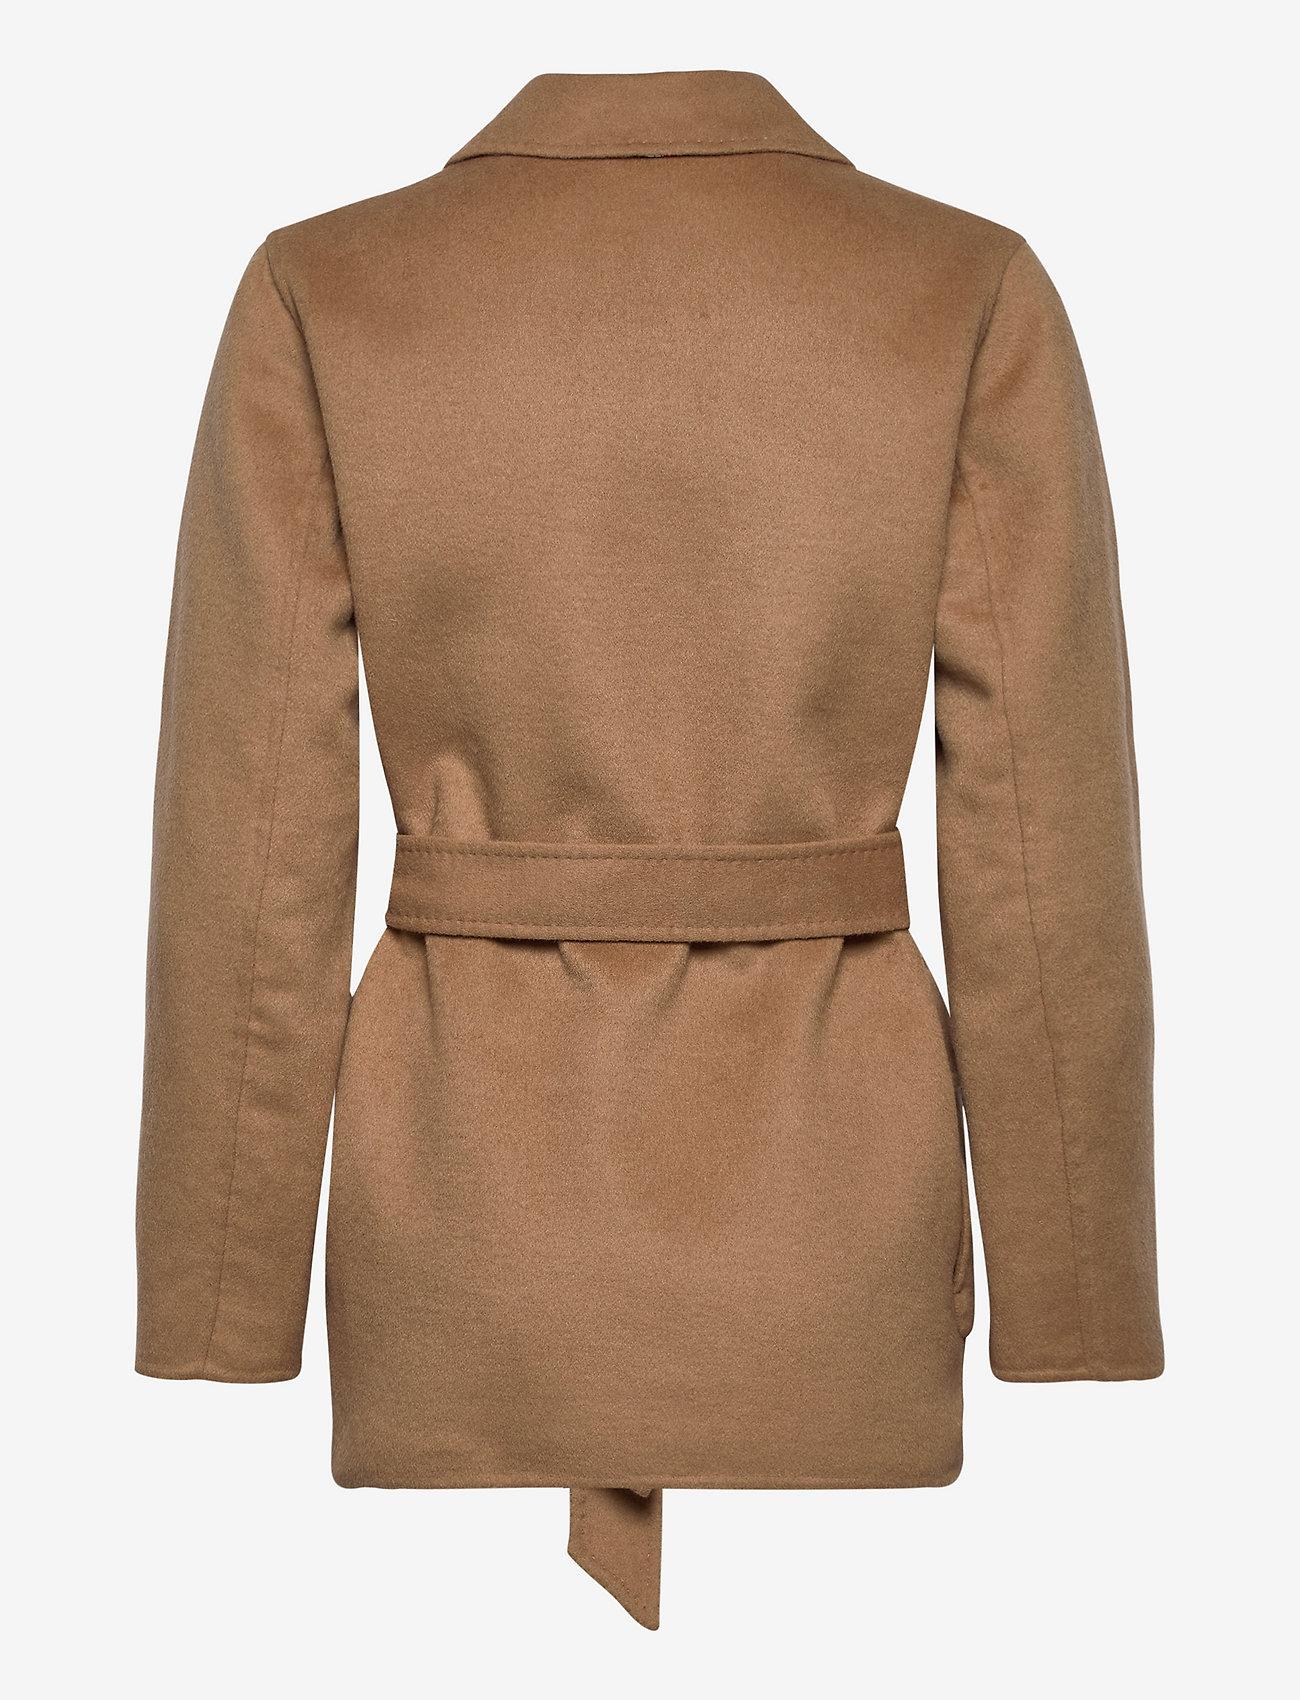 Tommy Hilfiger - WOOL BLEND DF HIP LENGTH COAT - winter coats - countryside khaki - 1